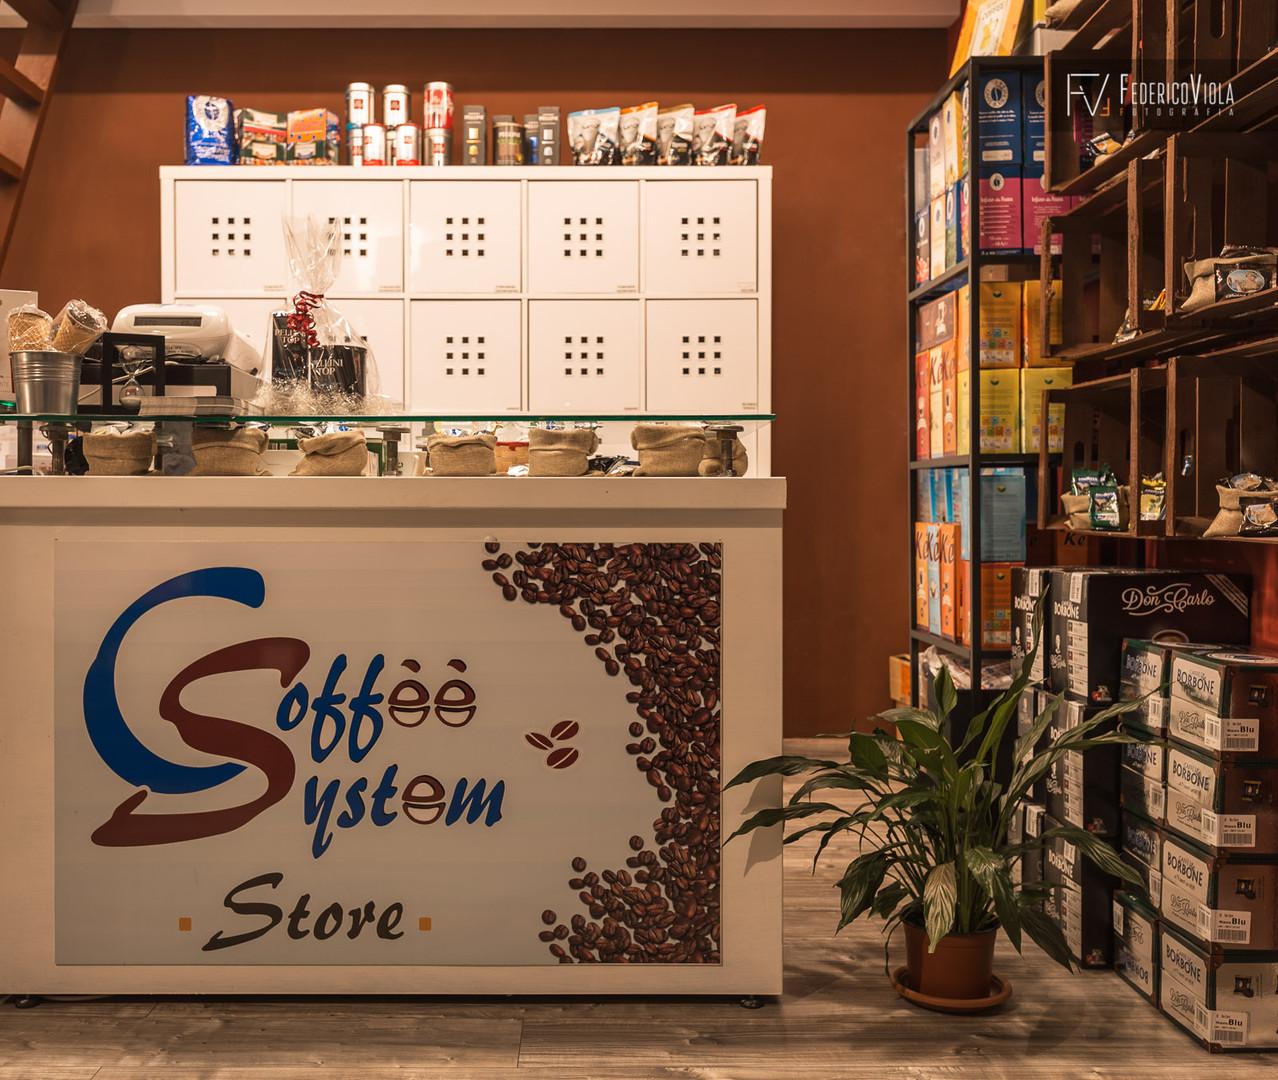 Foto-negozio-Coffee-System-Terracina-Federico-Viola-Fotografia-6